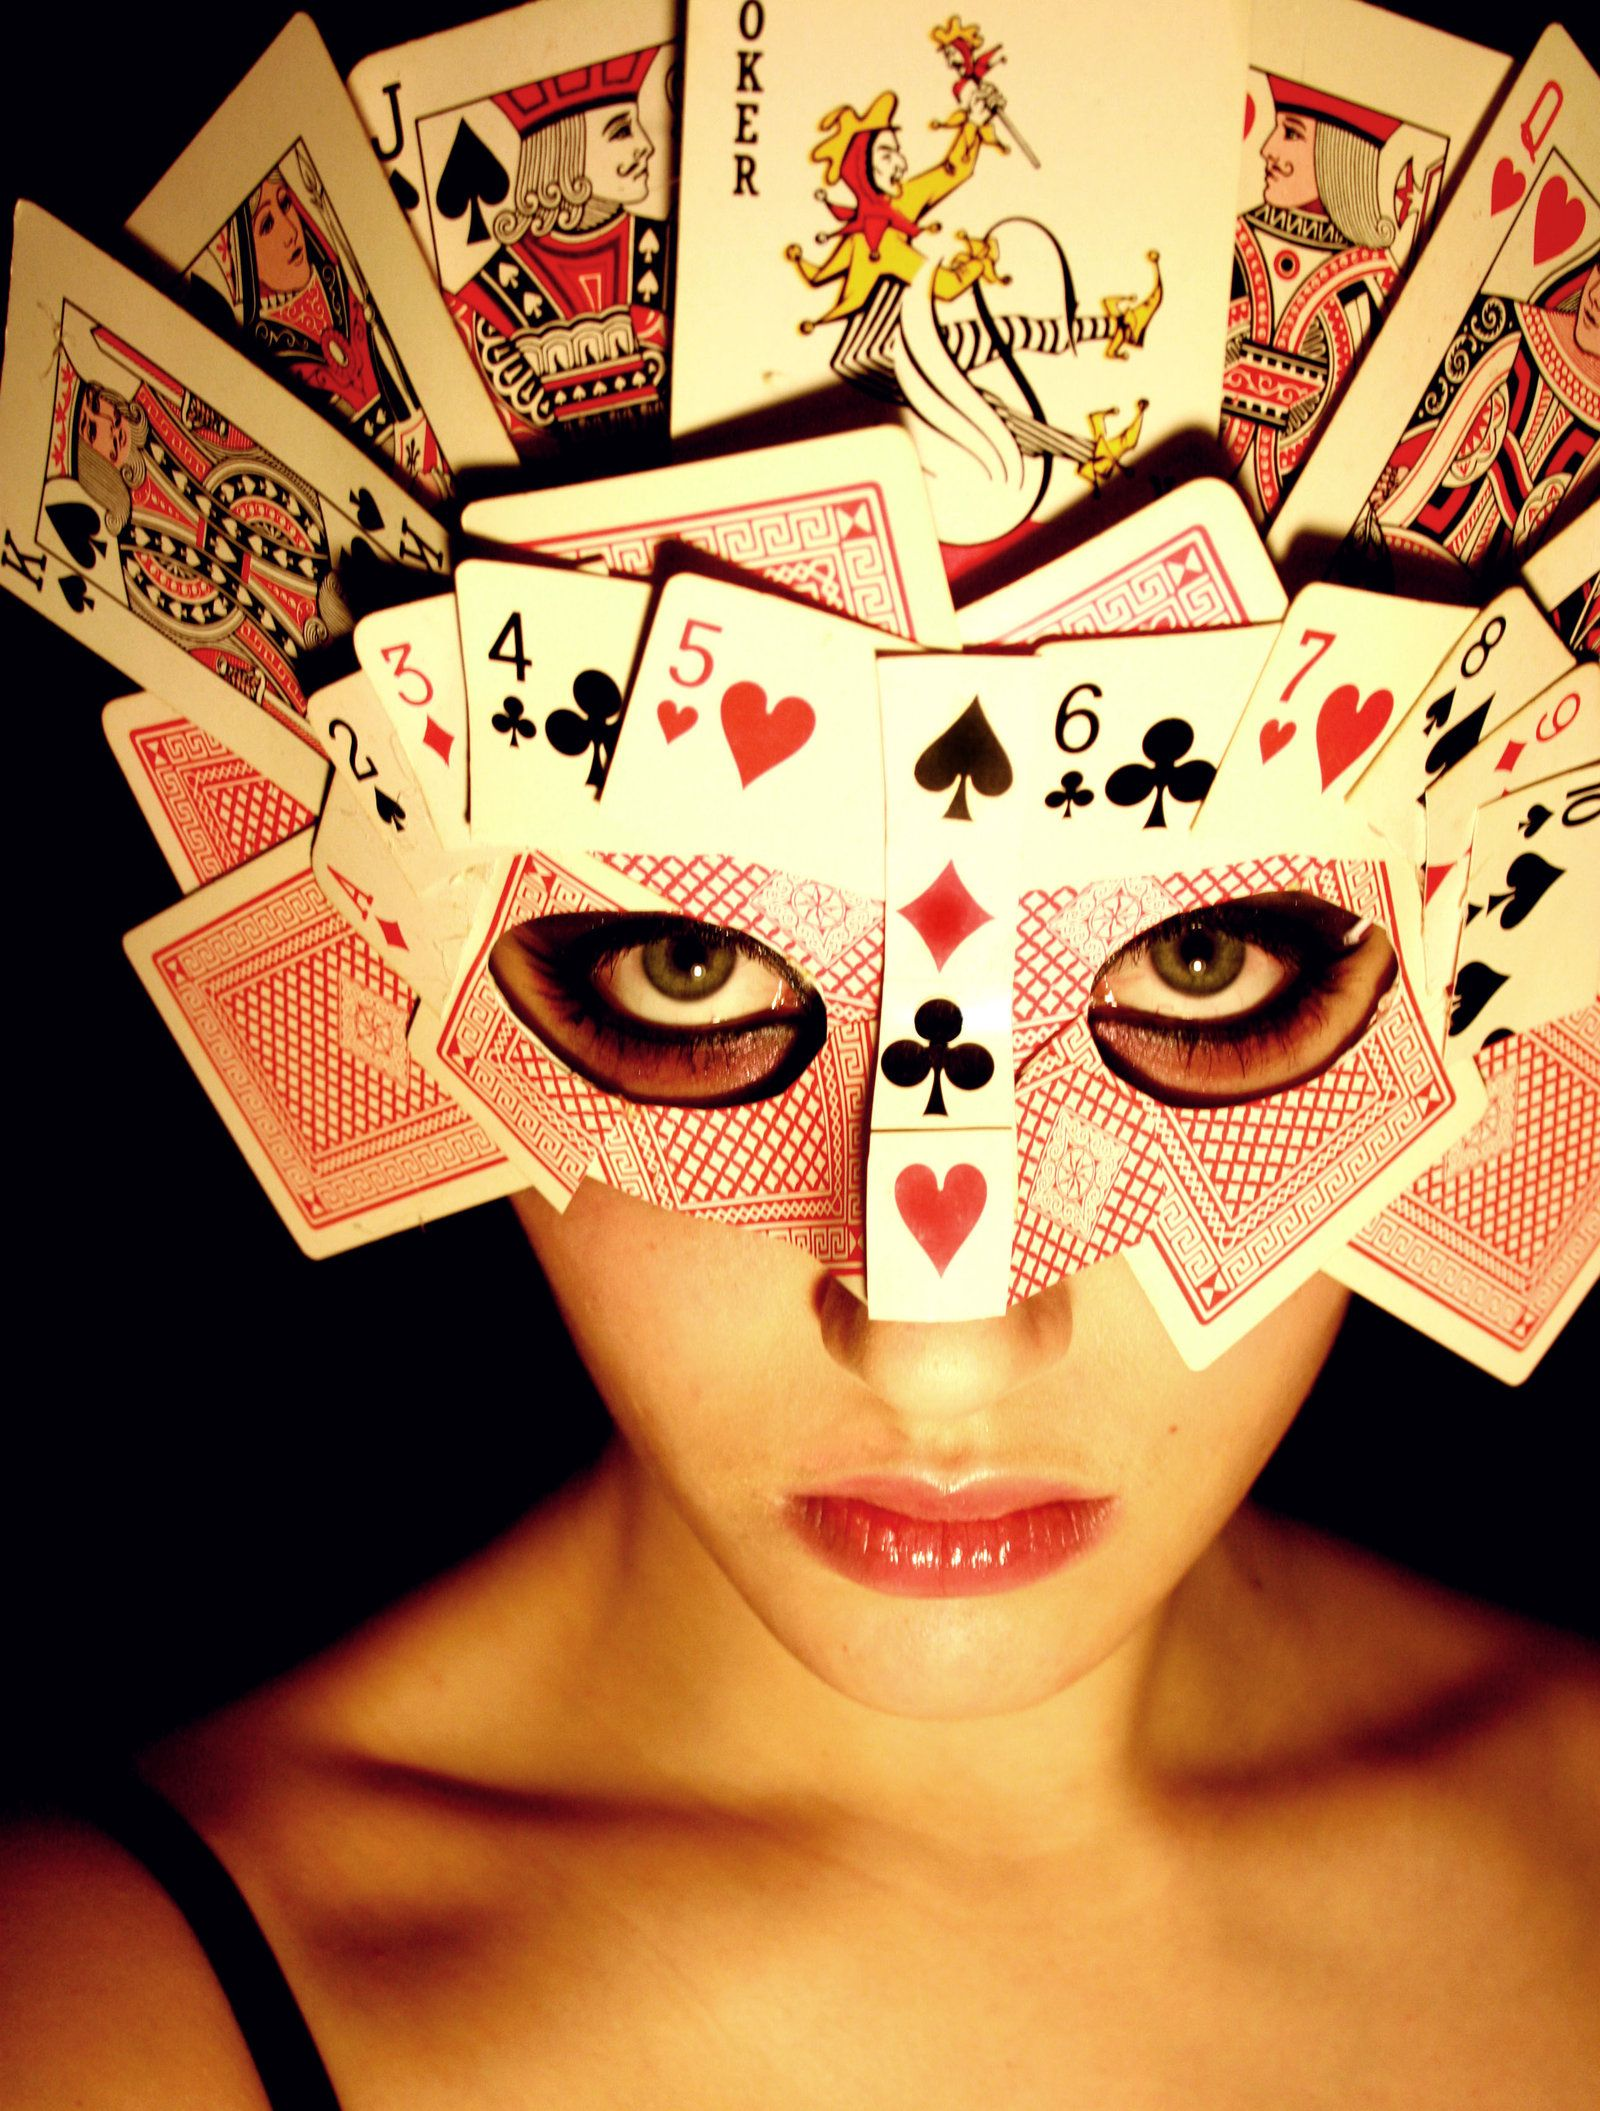 Poker Face 2 by on deviantART